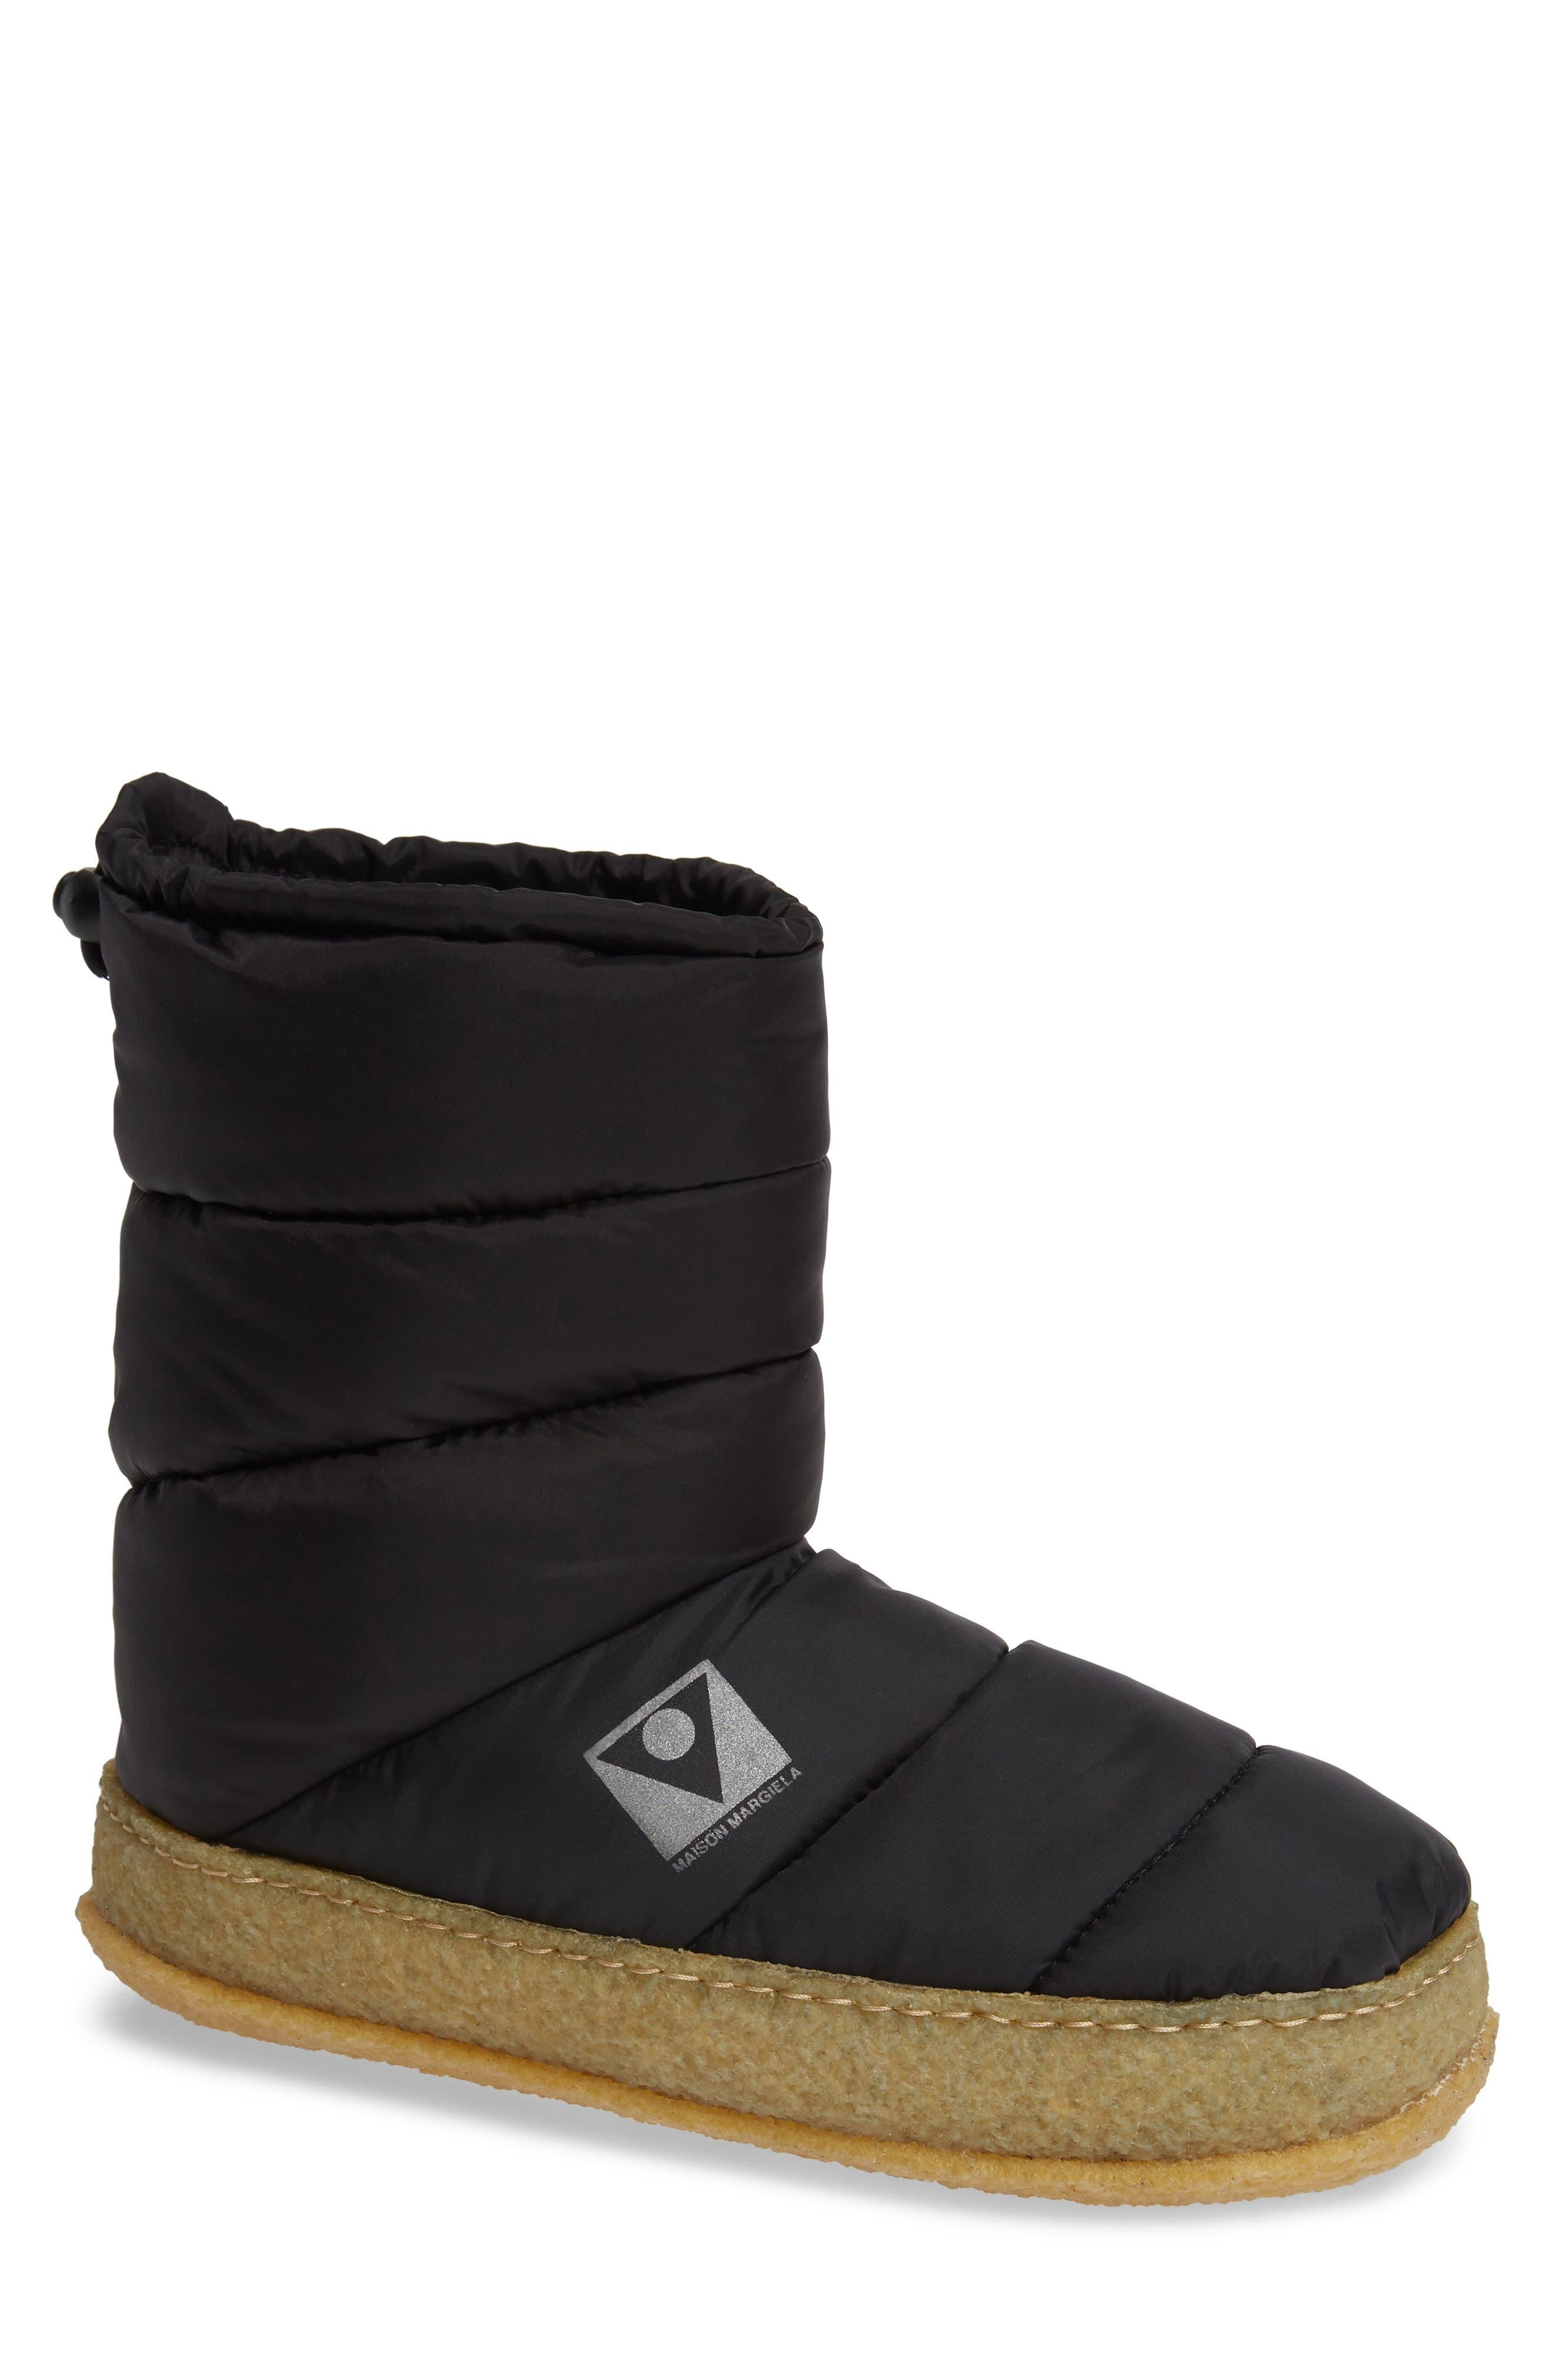 Maison Margiela Puffer Ankle Boot, Black